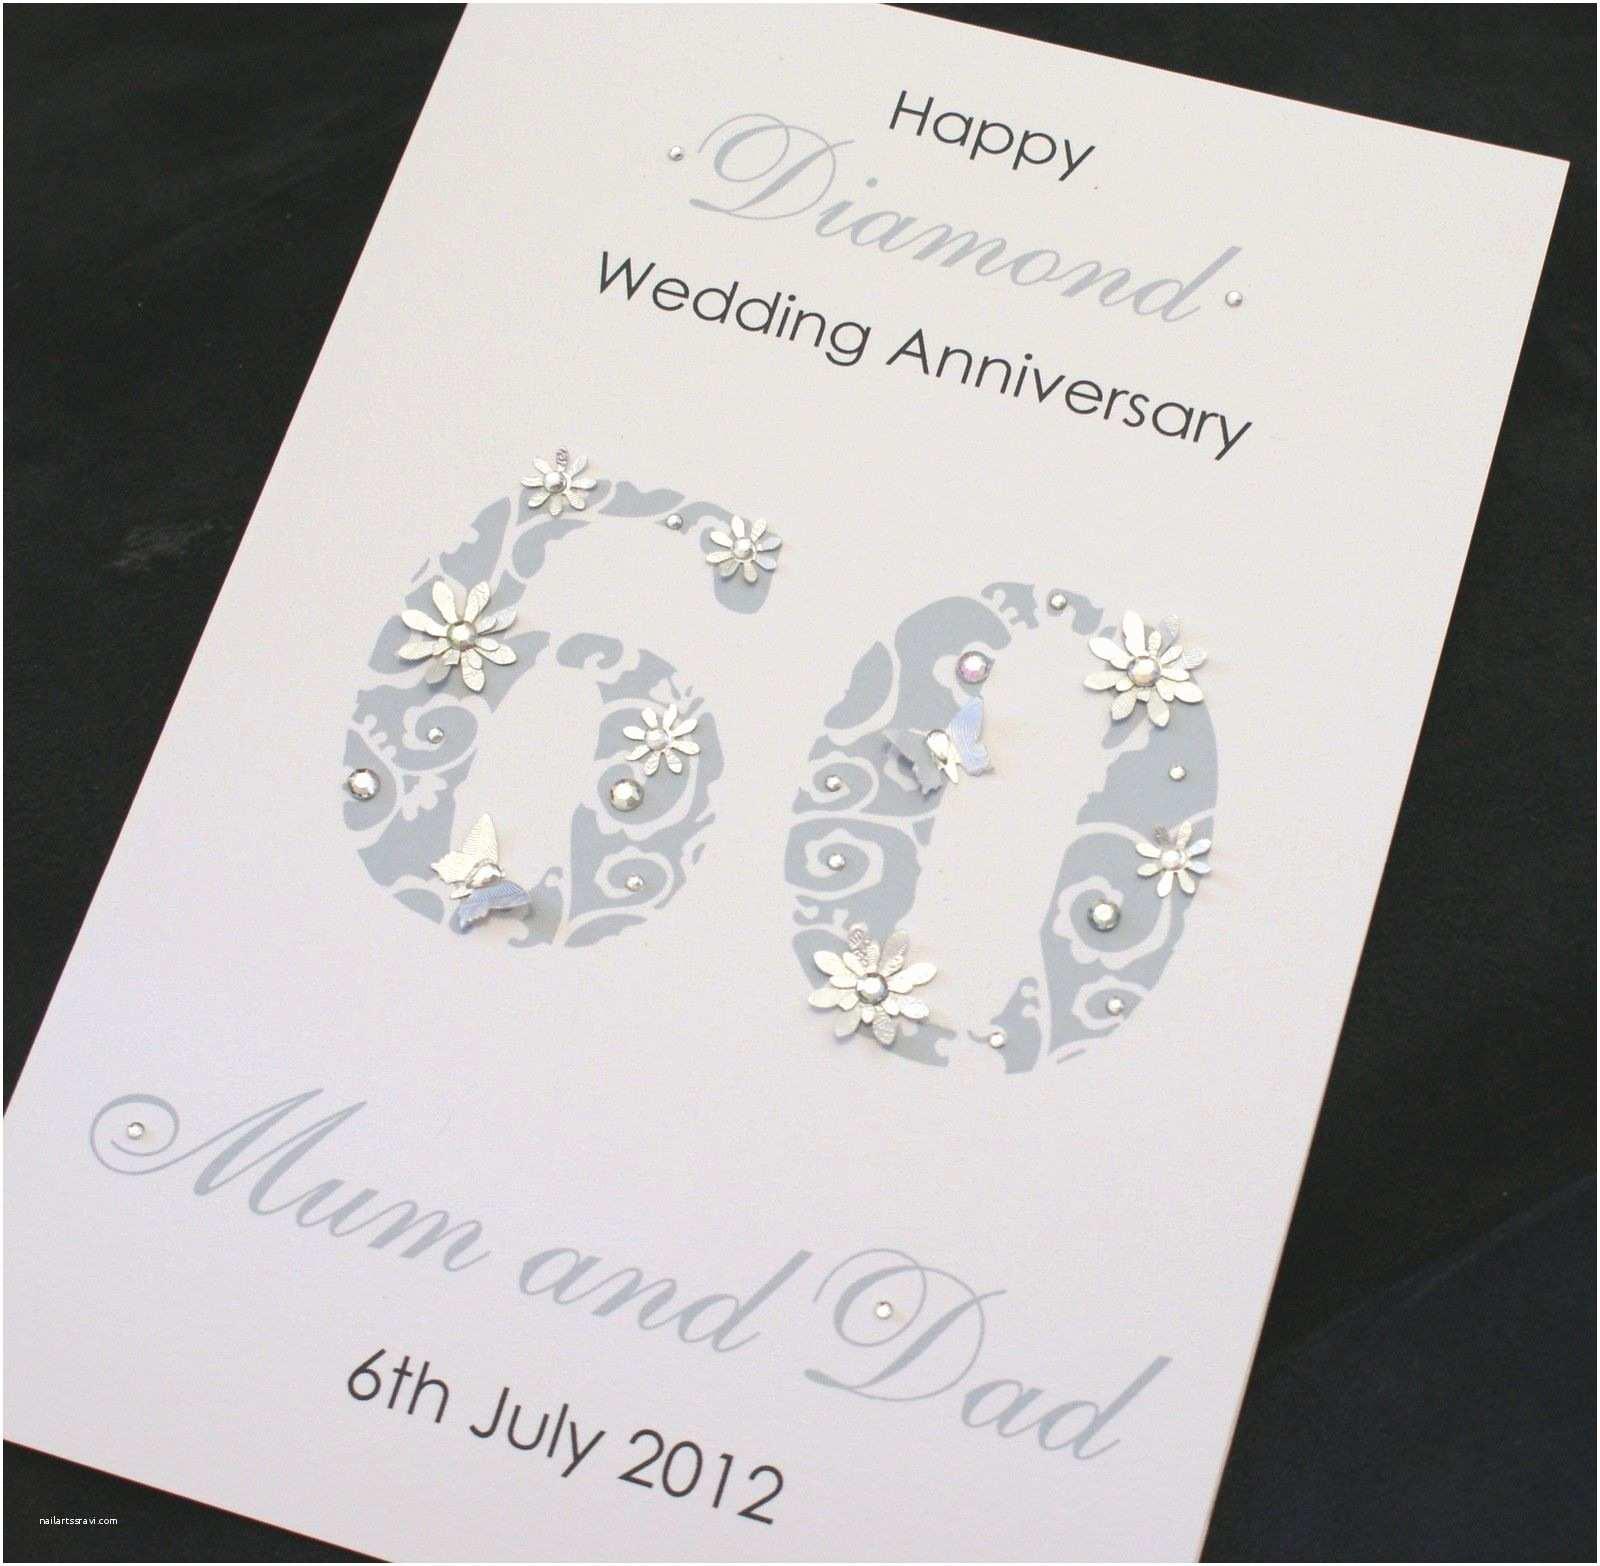 60th Wedding Anniversary Invitations Free Templates Large Handmade Personalised 60th Diamond Wedding